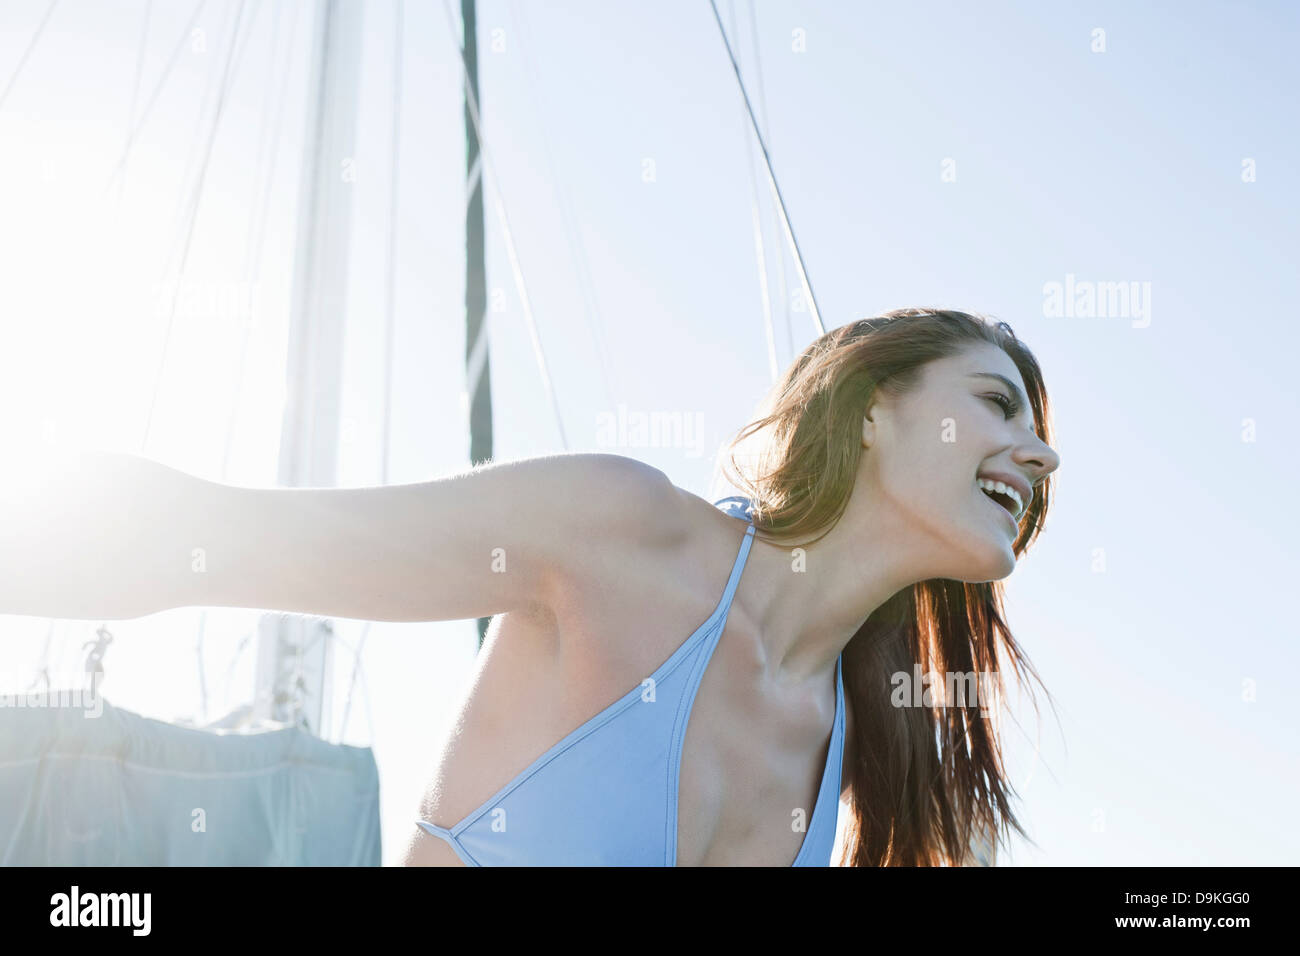 Jeune femme brune sur yacht, laughing Photo Stock